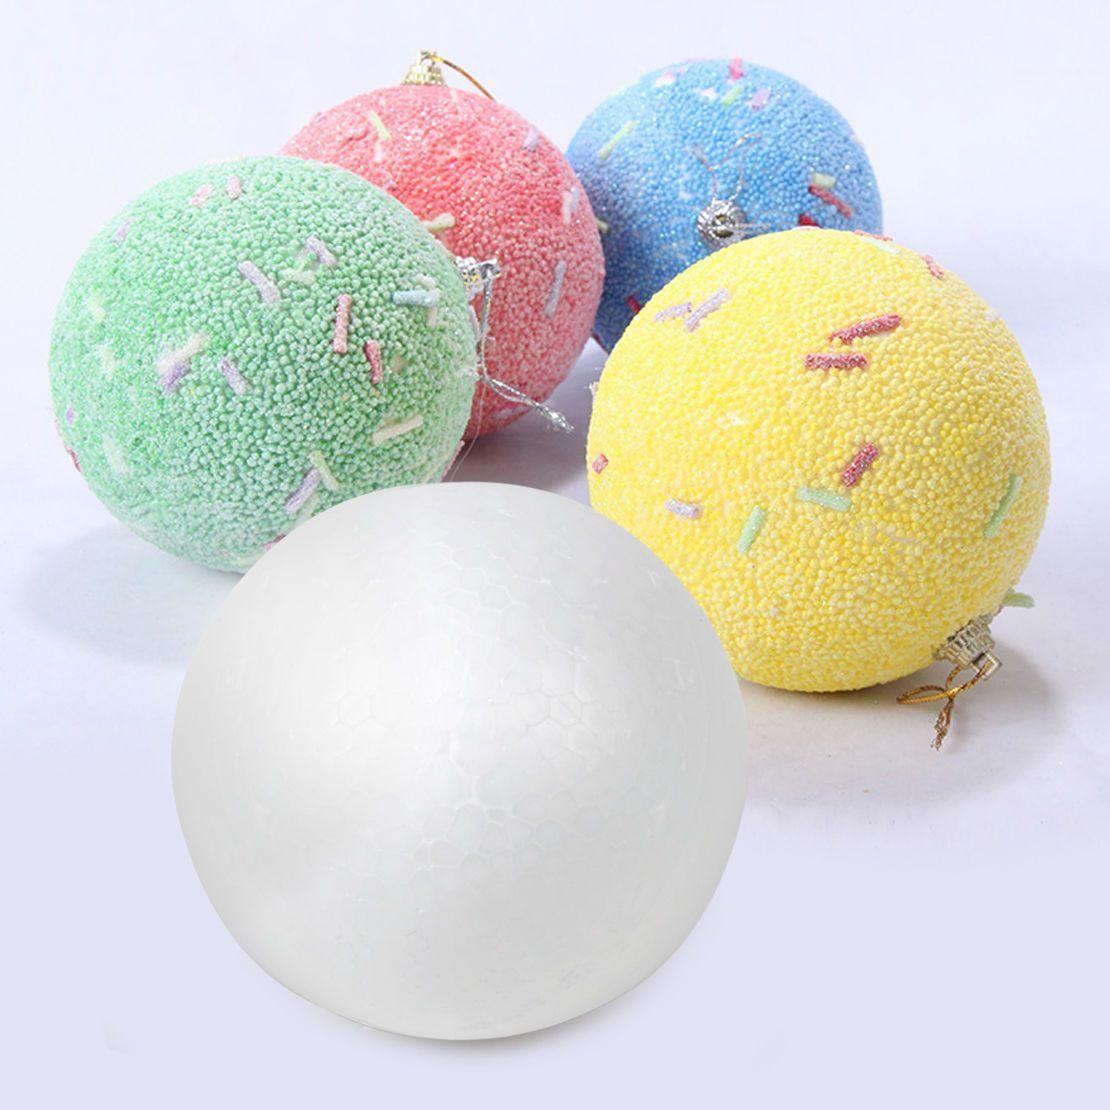 Foam ball craft - Details About Diy Child White 100mm Polystyrene Styrofoam Foam Ball Modelling Craft Decoration